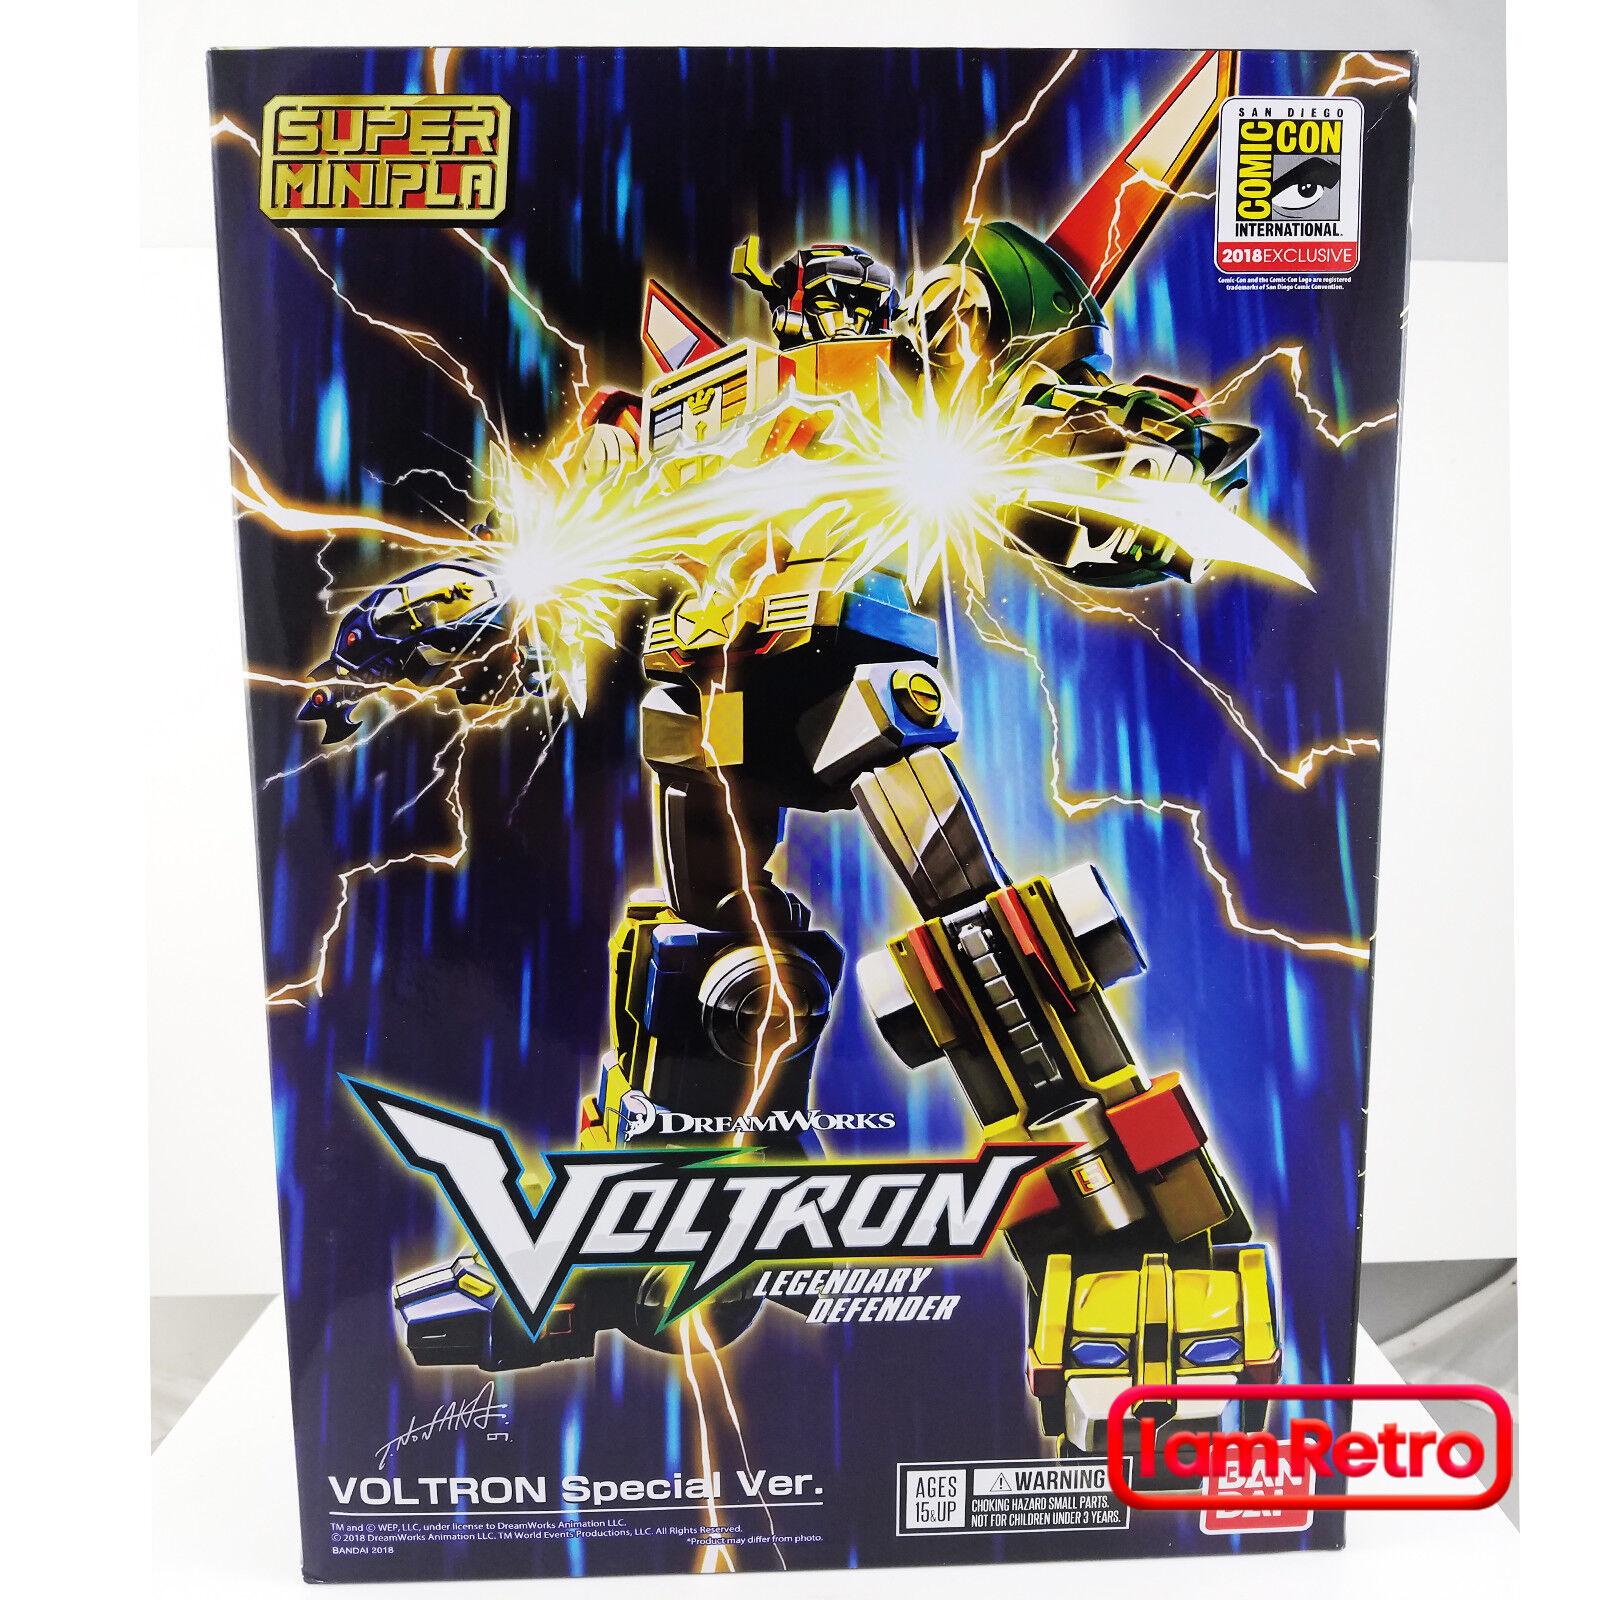 Voltron SDCC 2018 Exclusive Bandai Shokugan Super MiniPla DreamWorks Blaufin